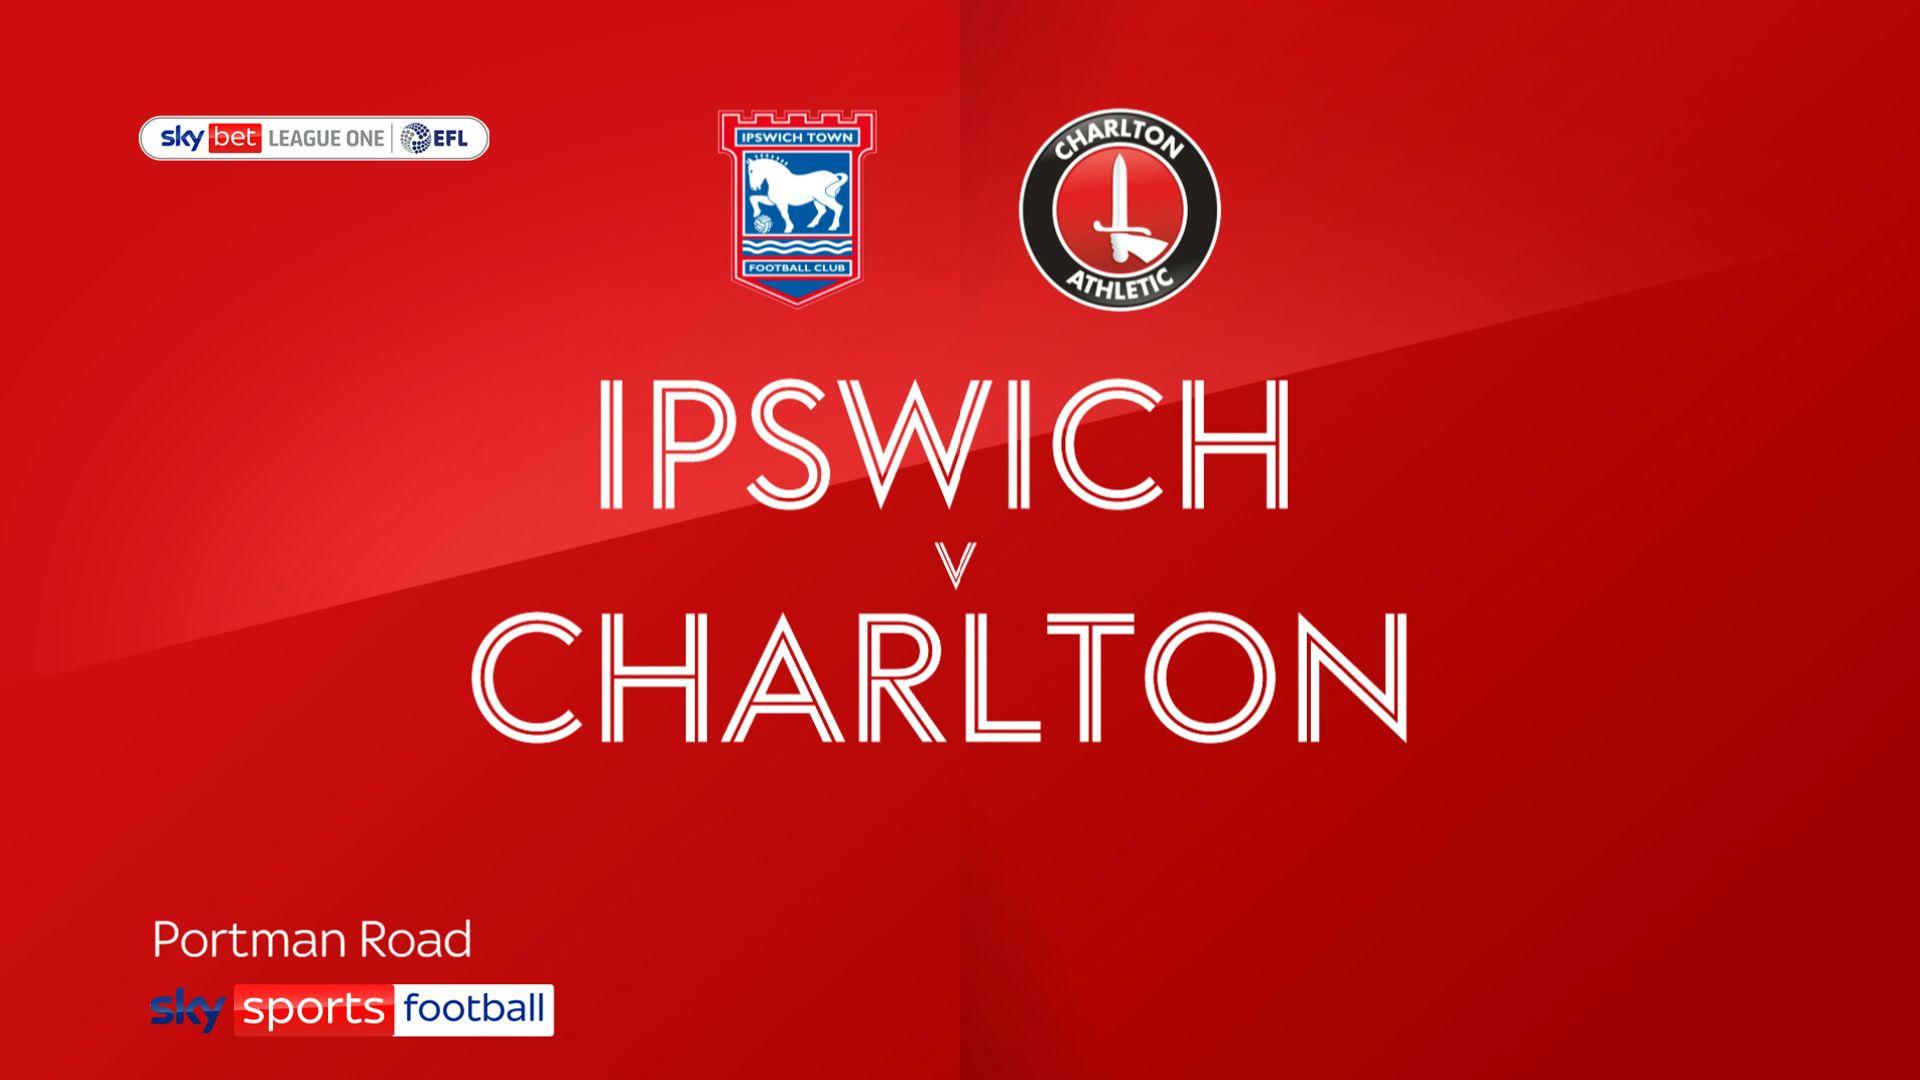 Charlton strike twice to sink Ipswich